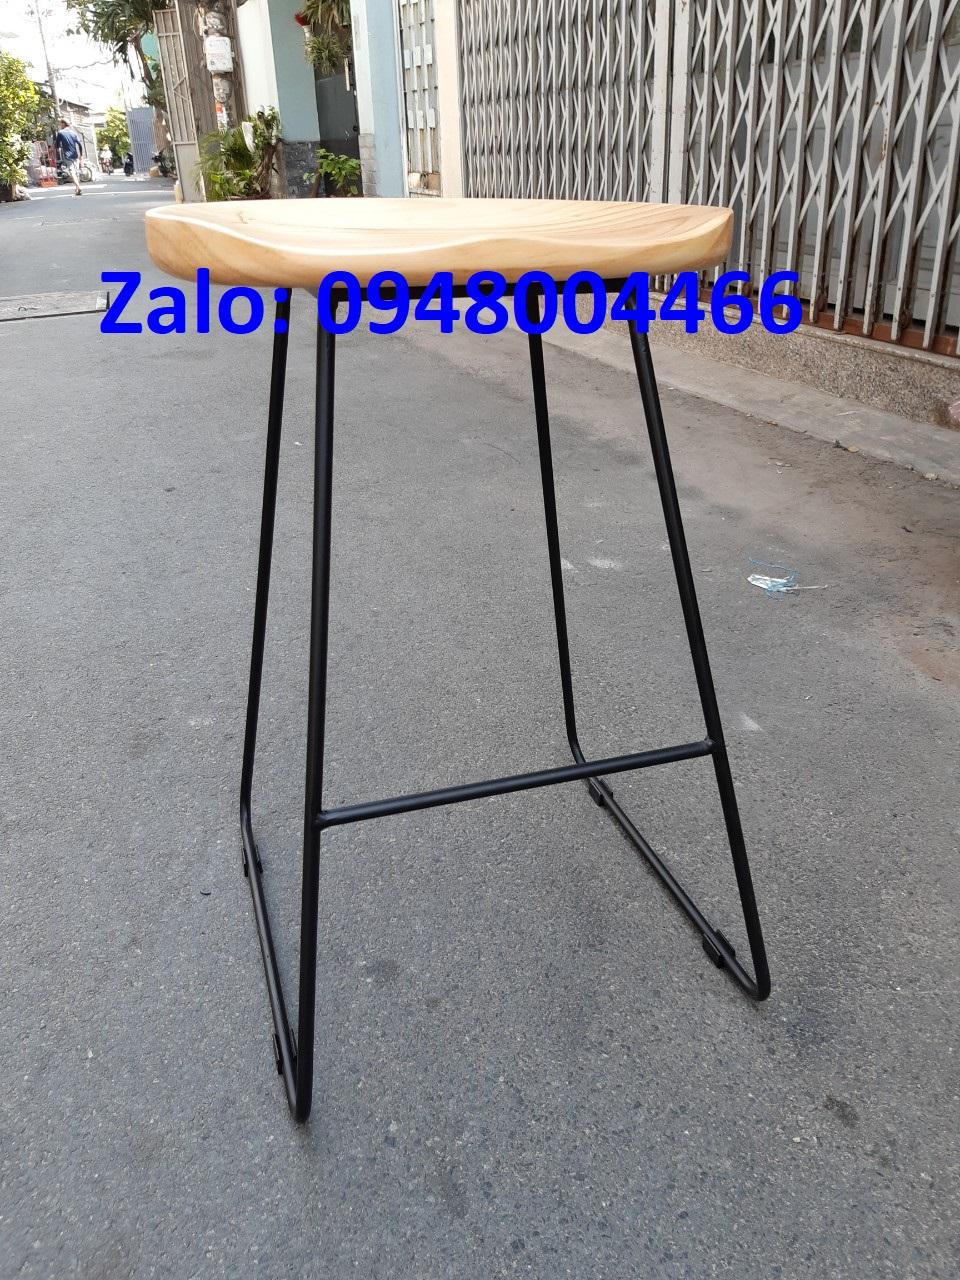 Ghế quầy cao chân sắt mặt gỗ tg6980